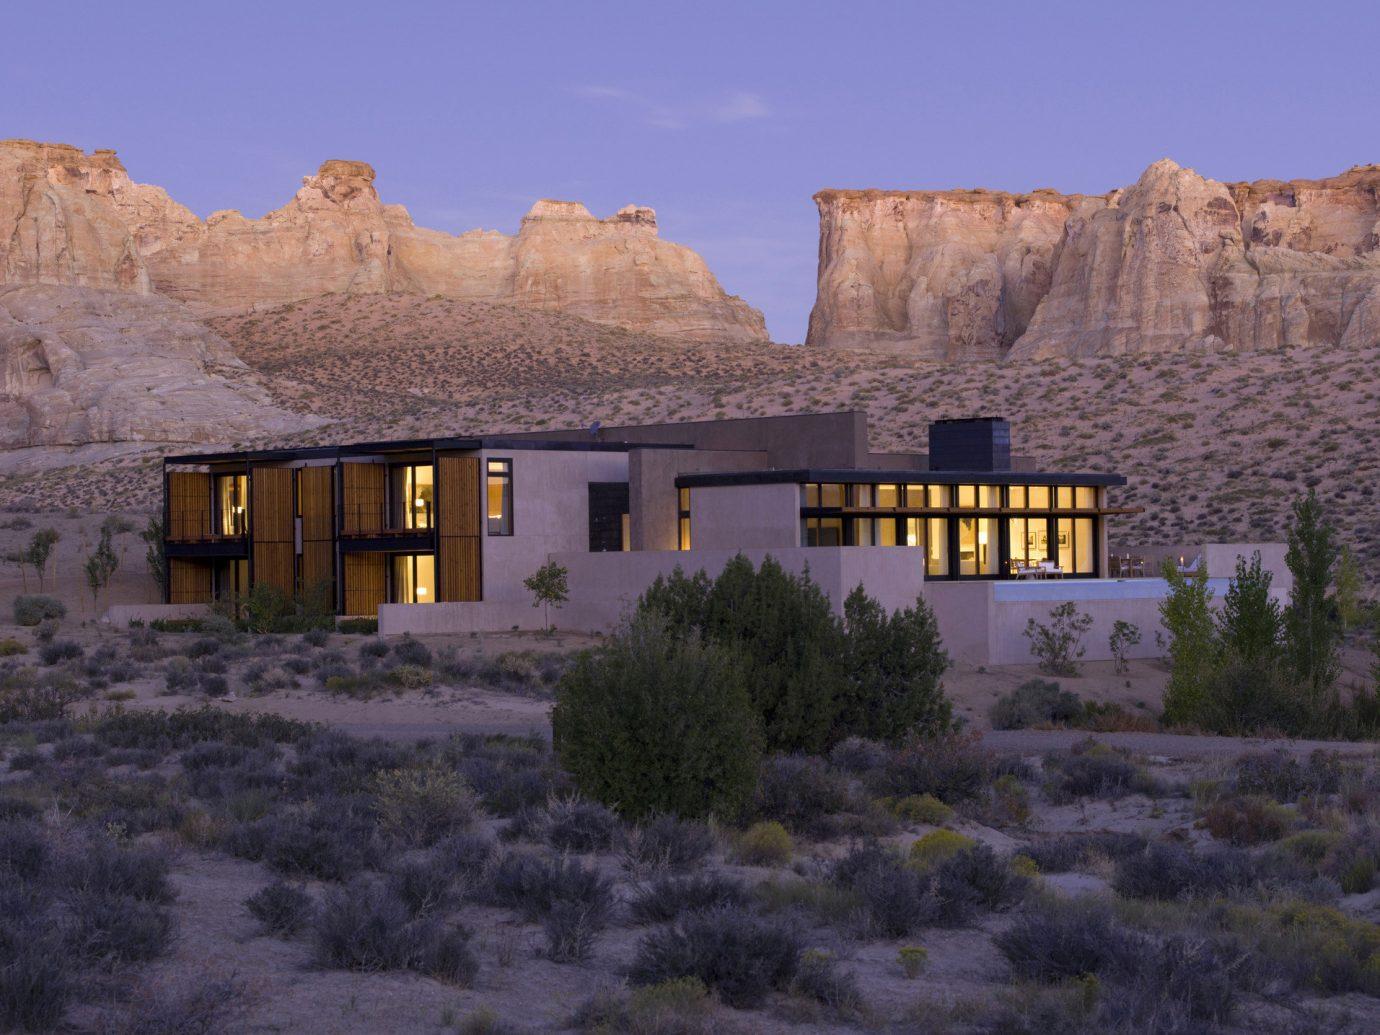 Hotels Romance outdoor grass mountain snow house Winter rock landscape valley monastery old terrain ruin stone